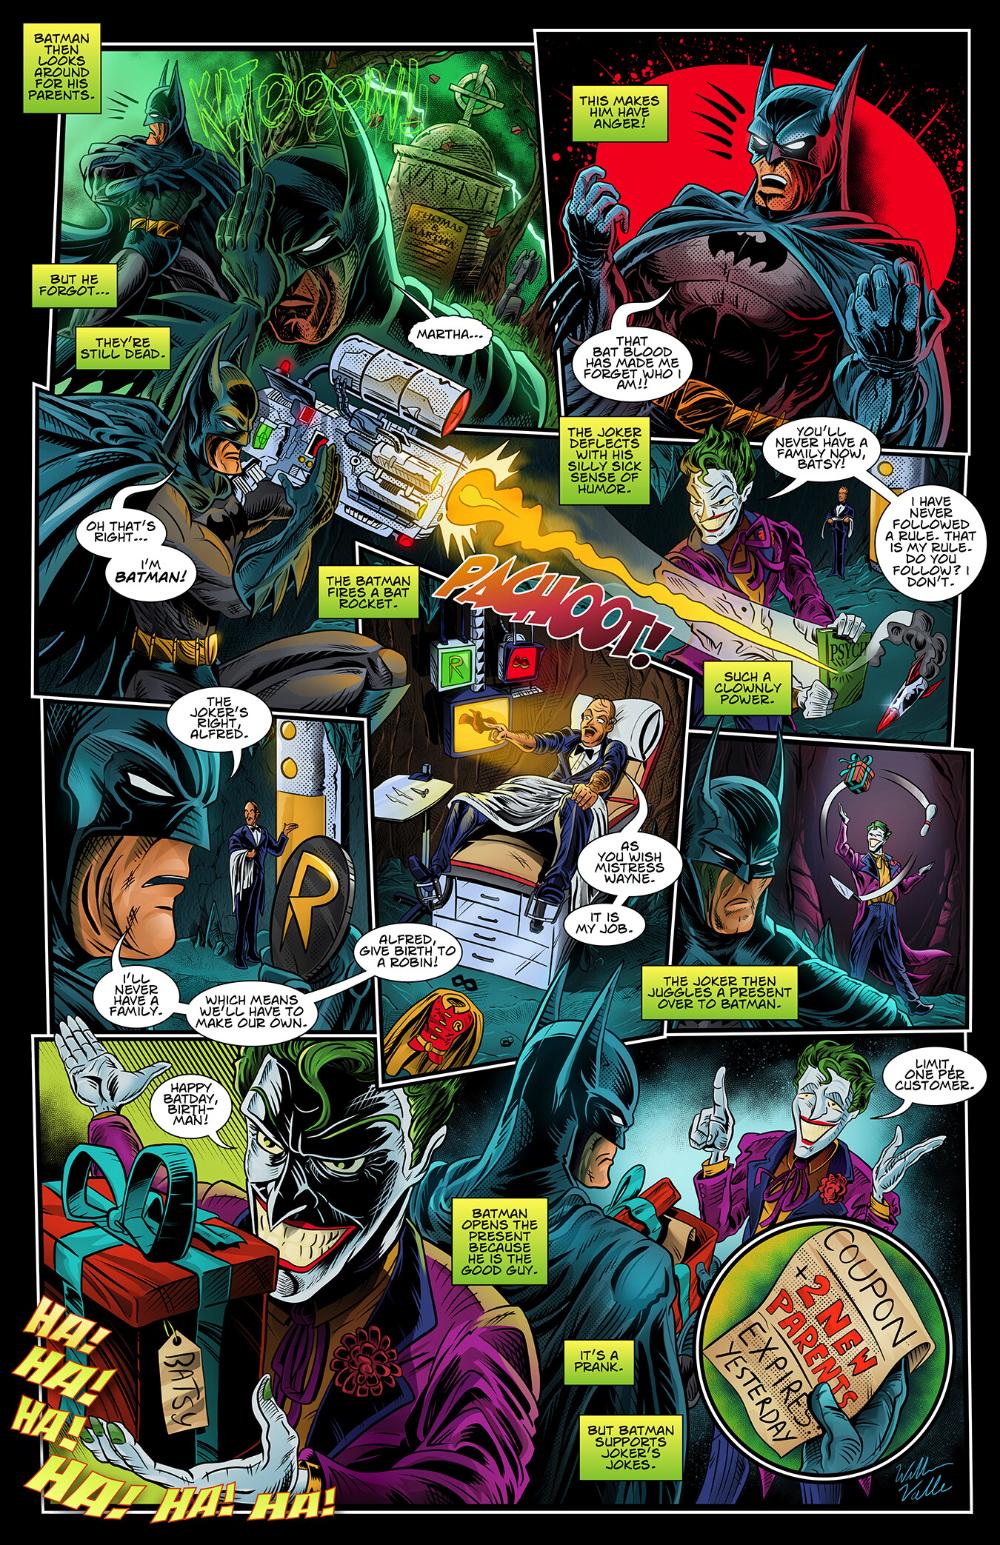 ArtStation A.I. Batman Script Comic, William Valle in